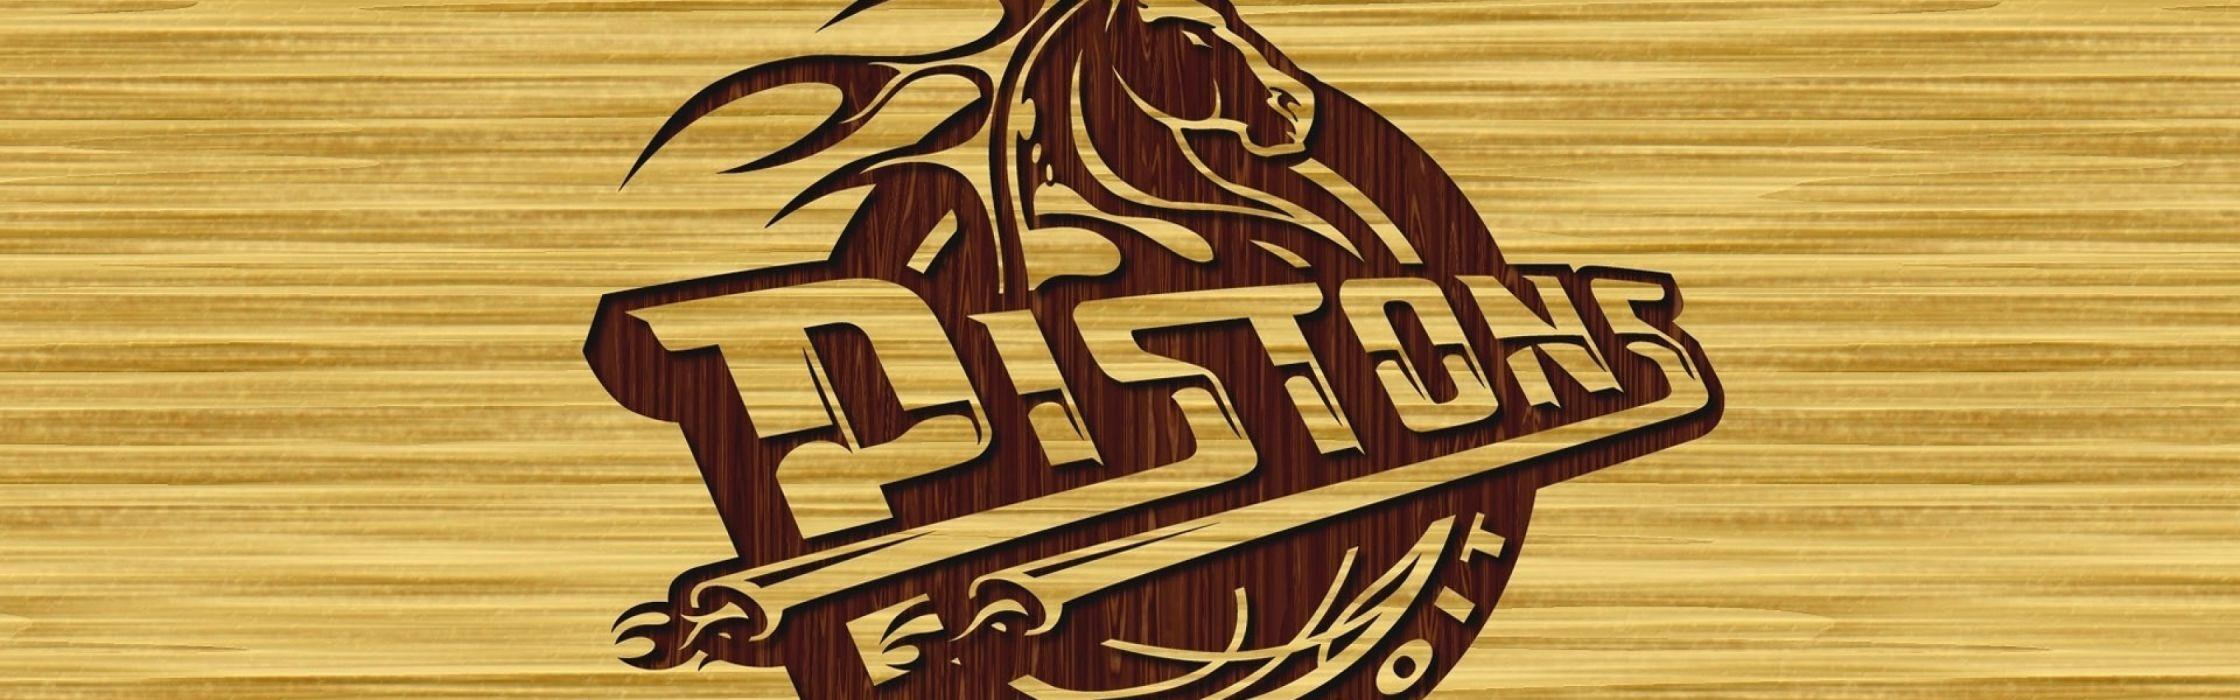 DETROIT PISTONS basketball nba (14) wallpaper